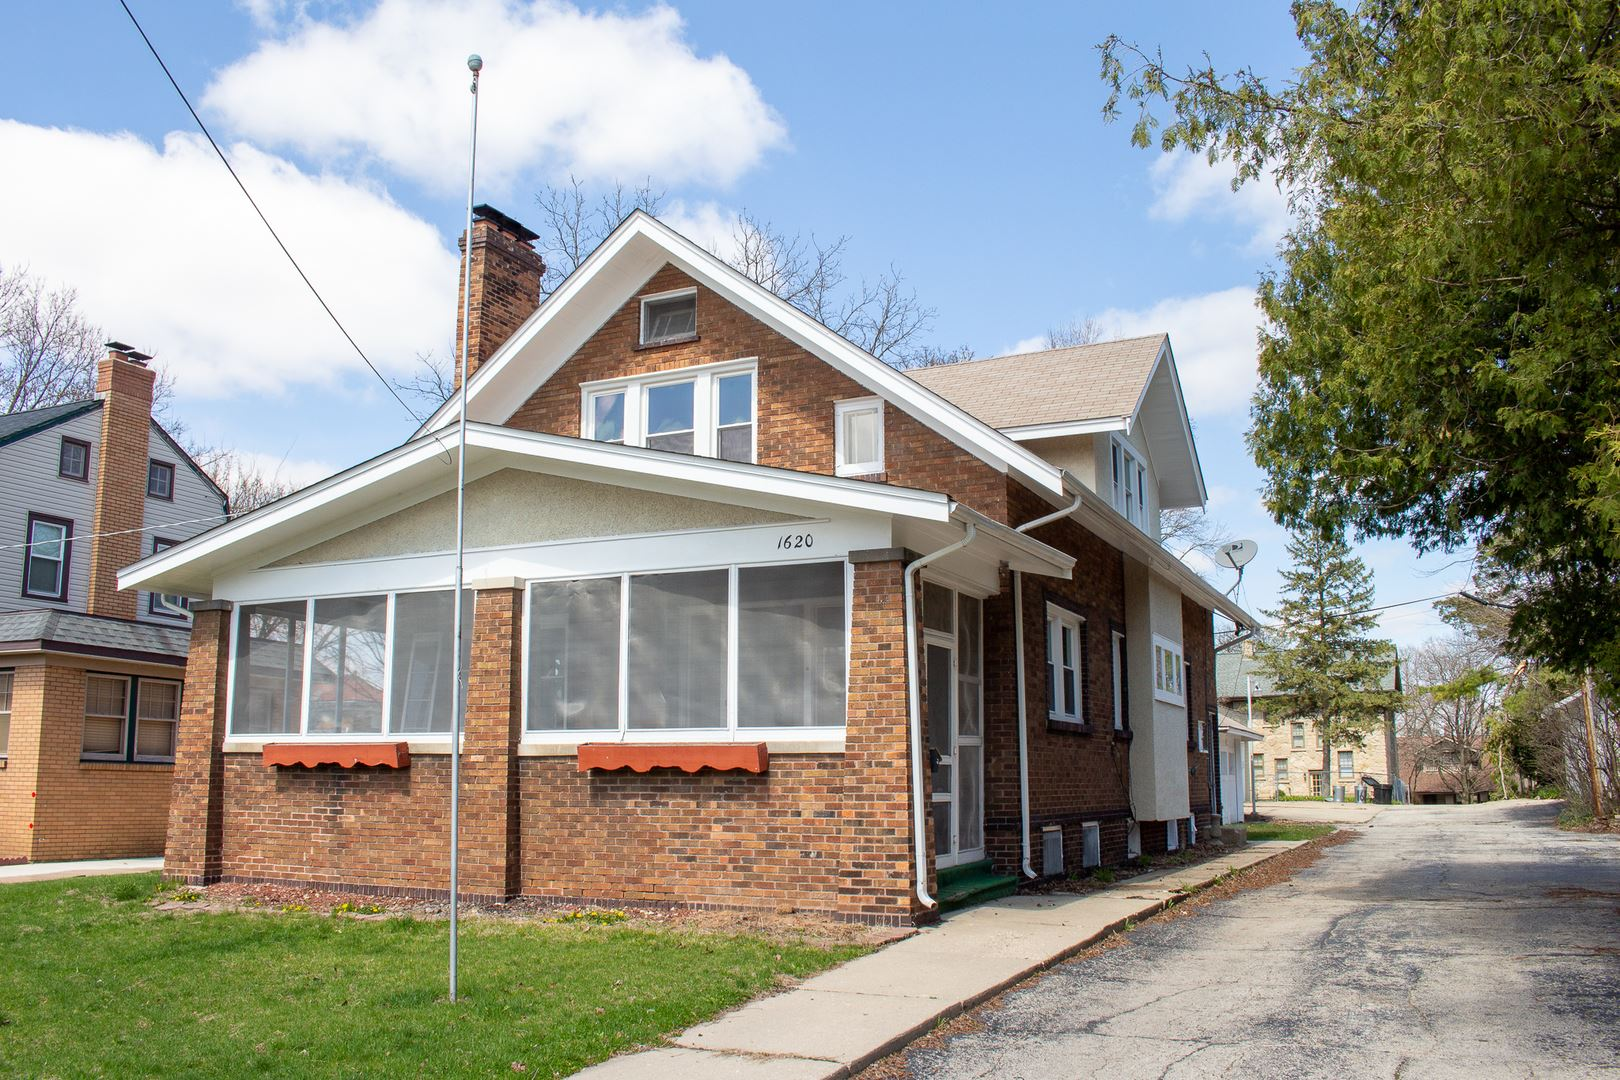 1620 Prospect Court, Rockford, IL 61107 - #: 10640175